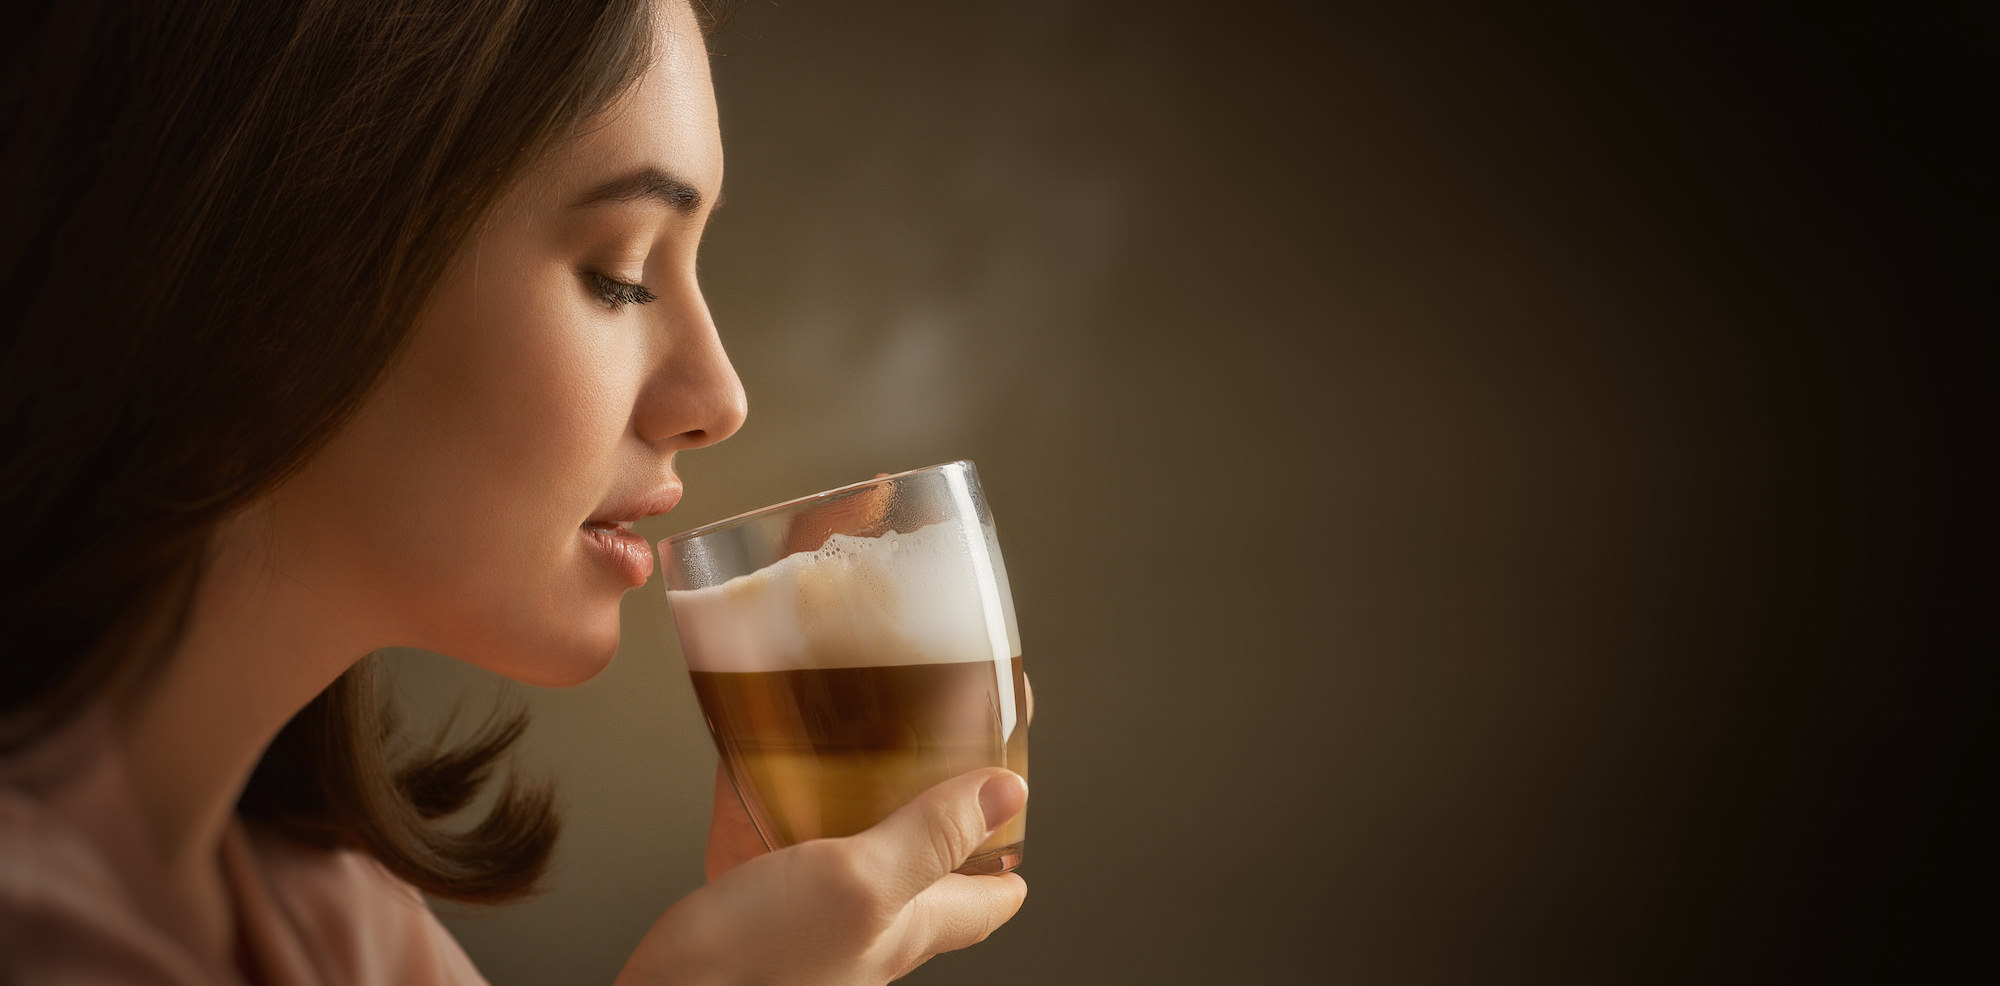 Excellentas_specialty_coffee_gourmet_feinschmecker_edel_feinkost_exzellenter_kaffee_spezialitaet_spezialitaetenkaffee_6